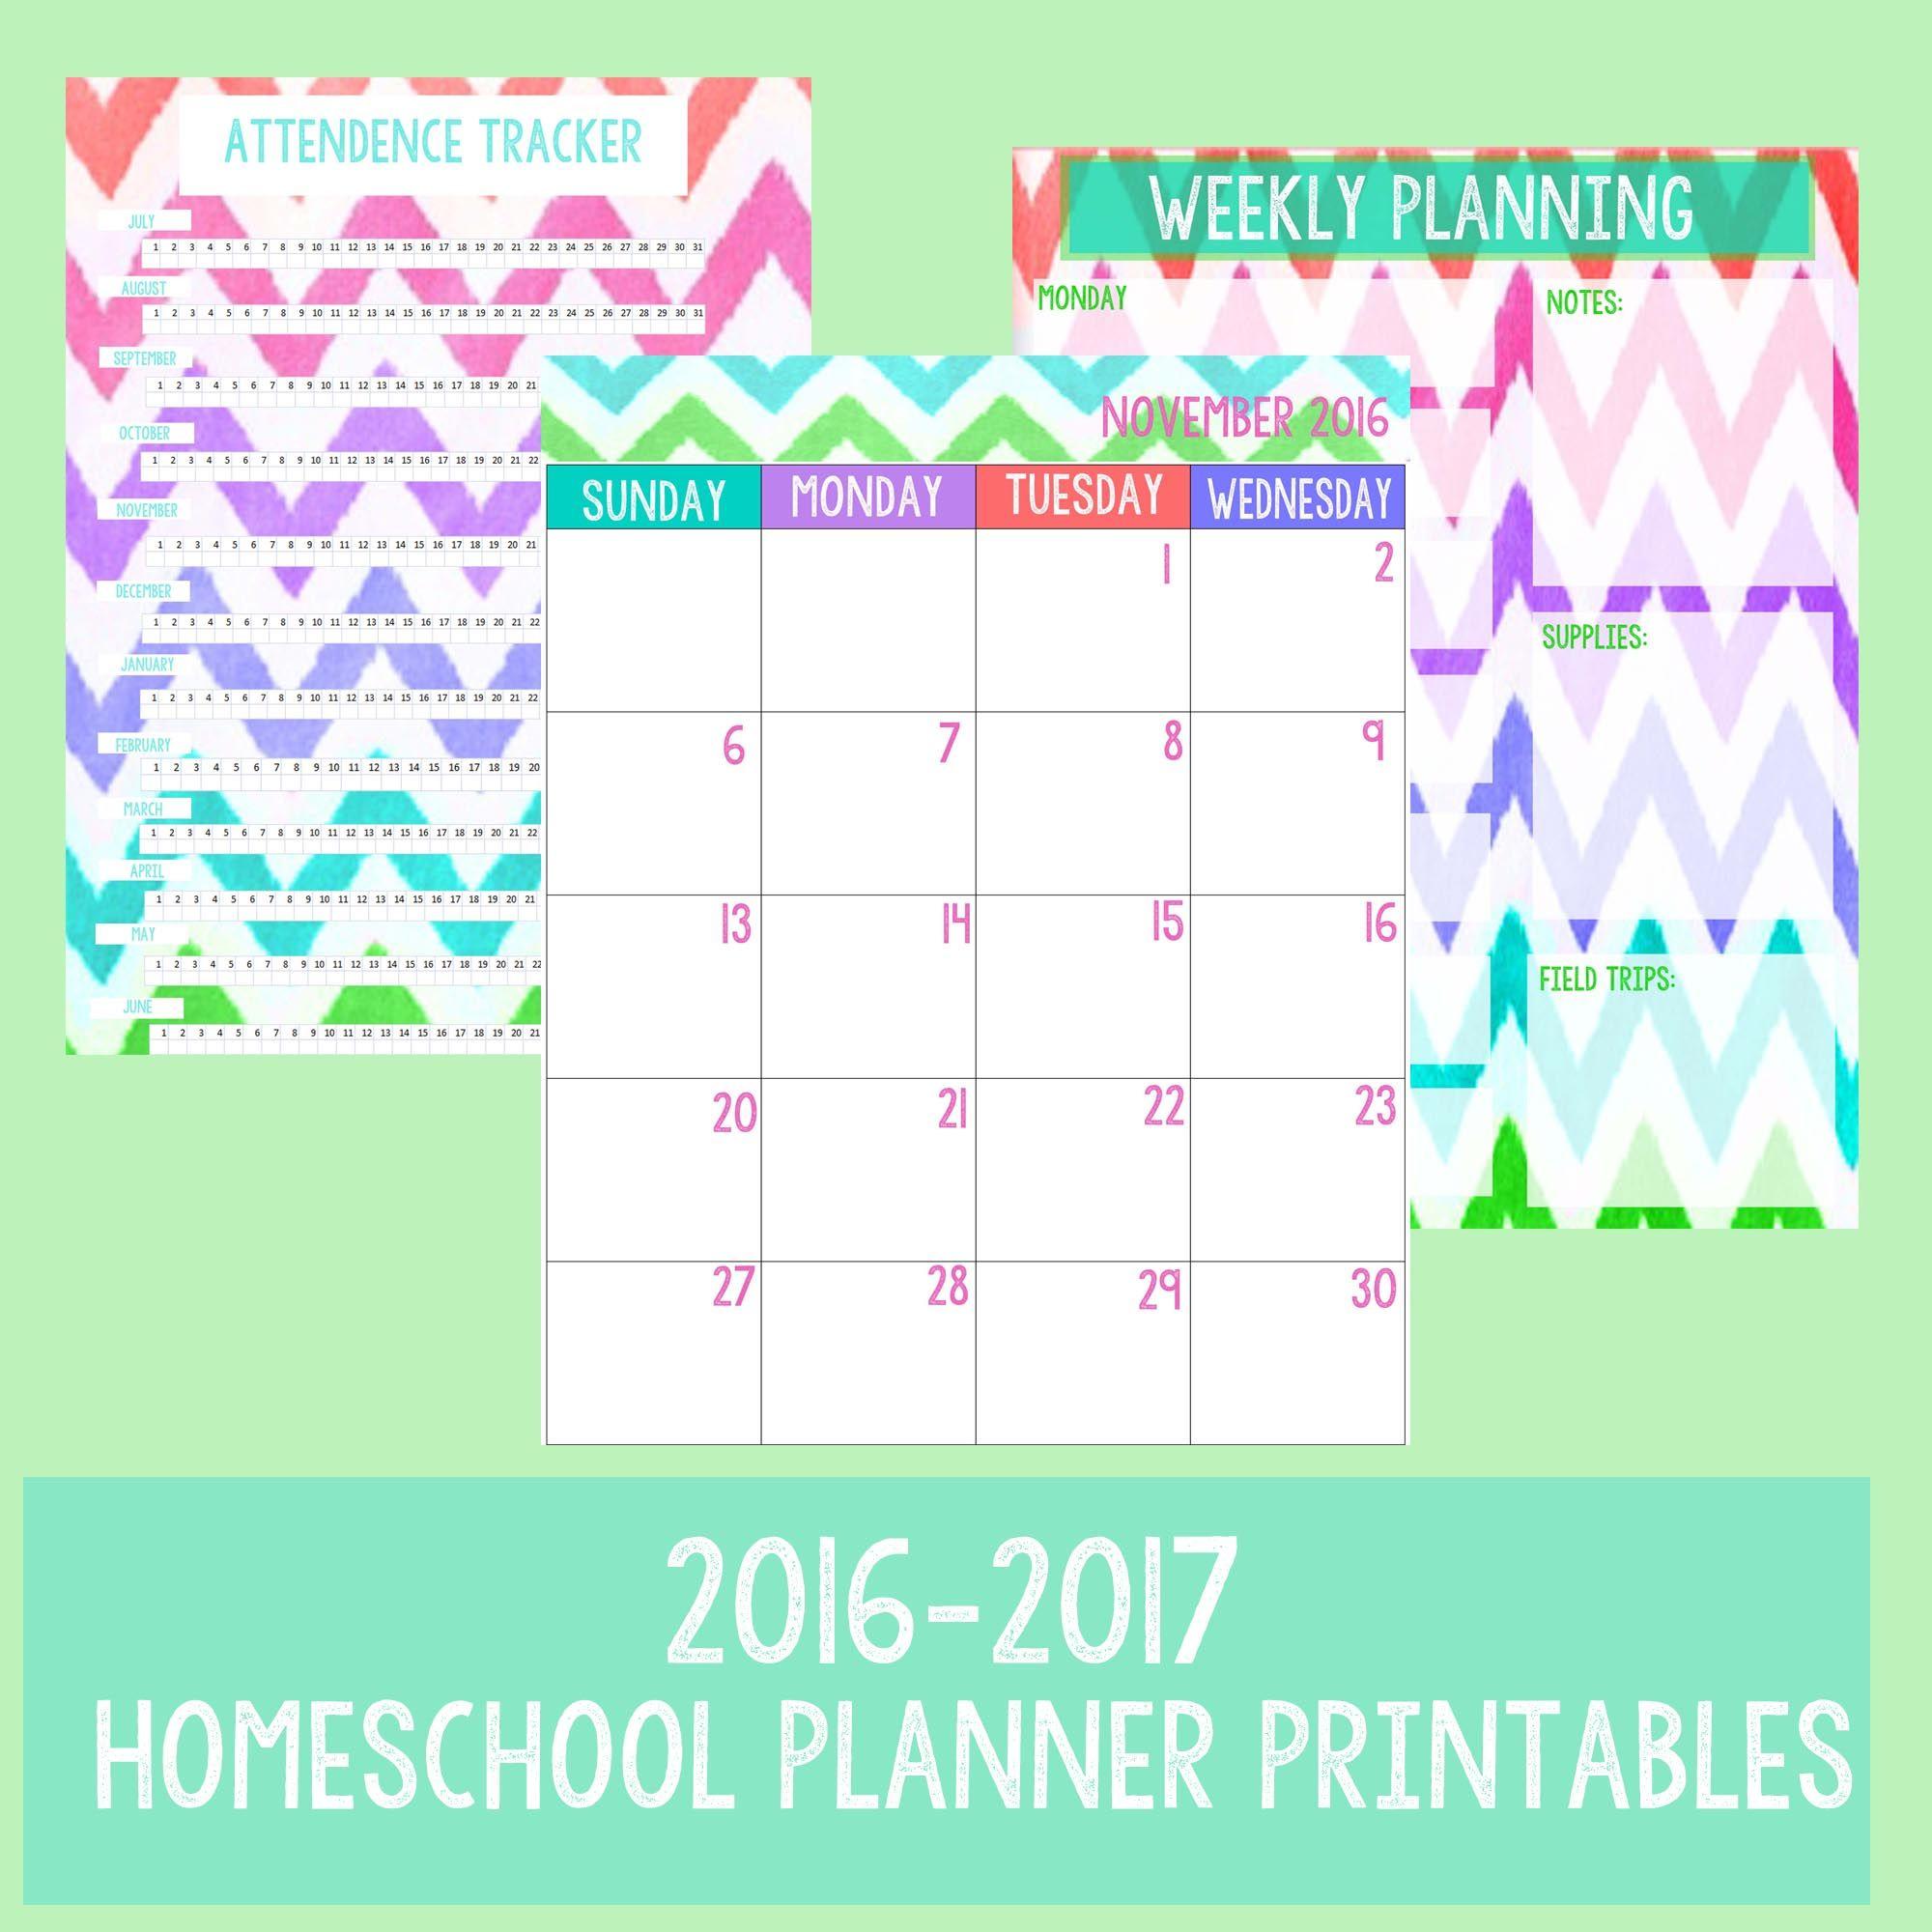 Homeschool Planner Printables For Binders With